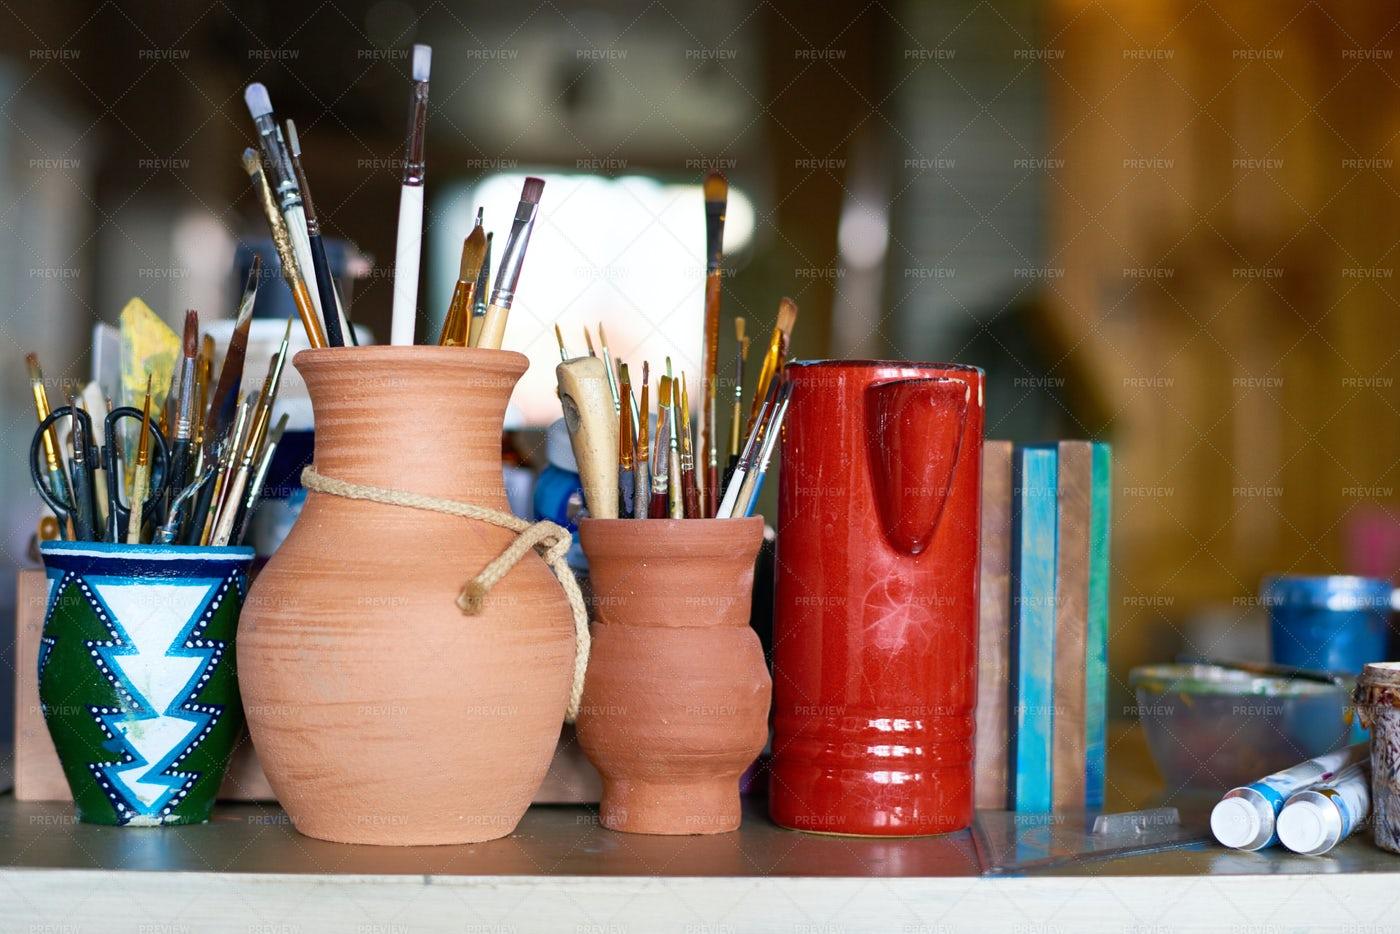 Art Supplies In Pottery Studio: Stock Photos